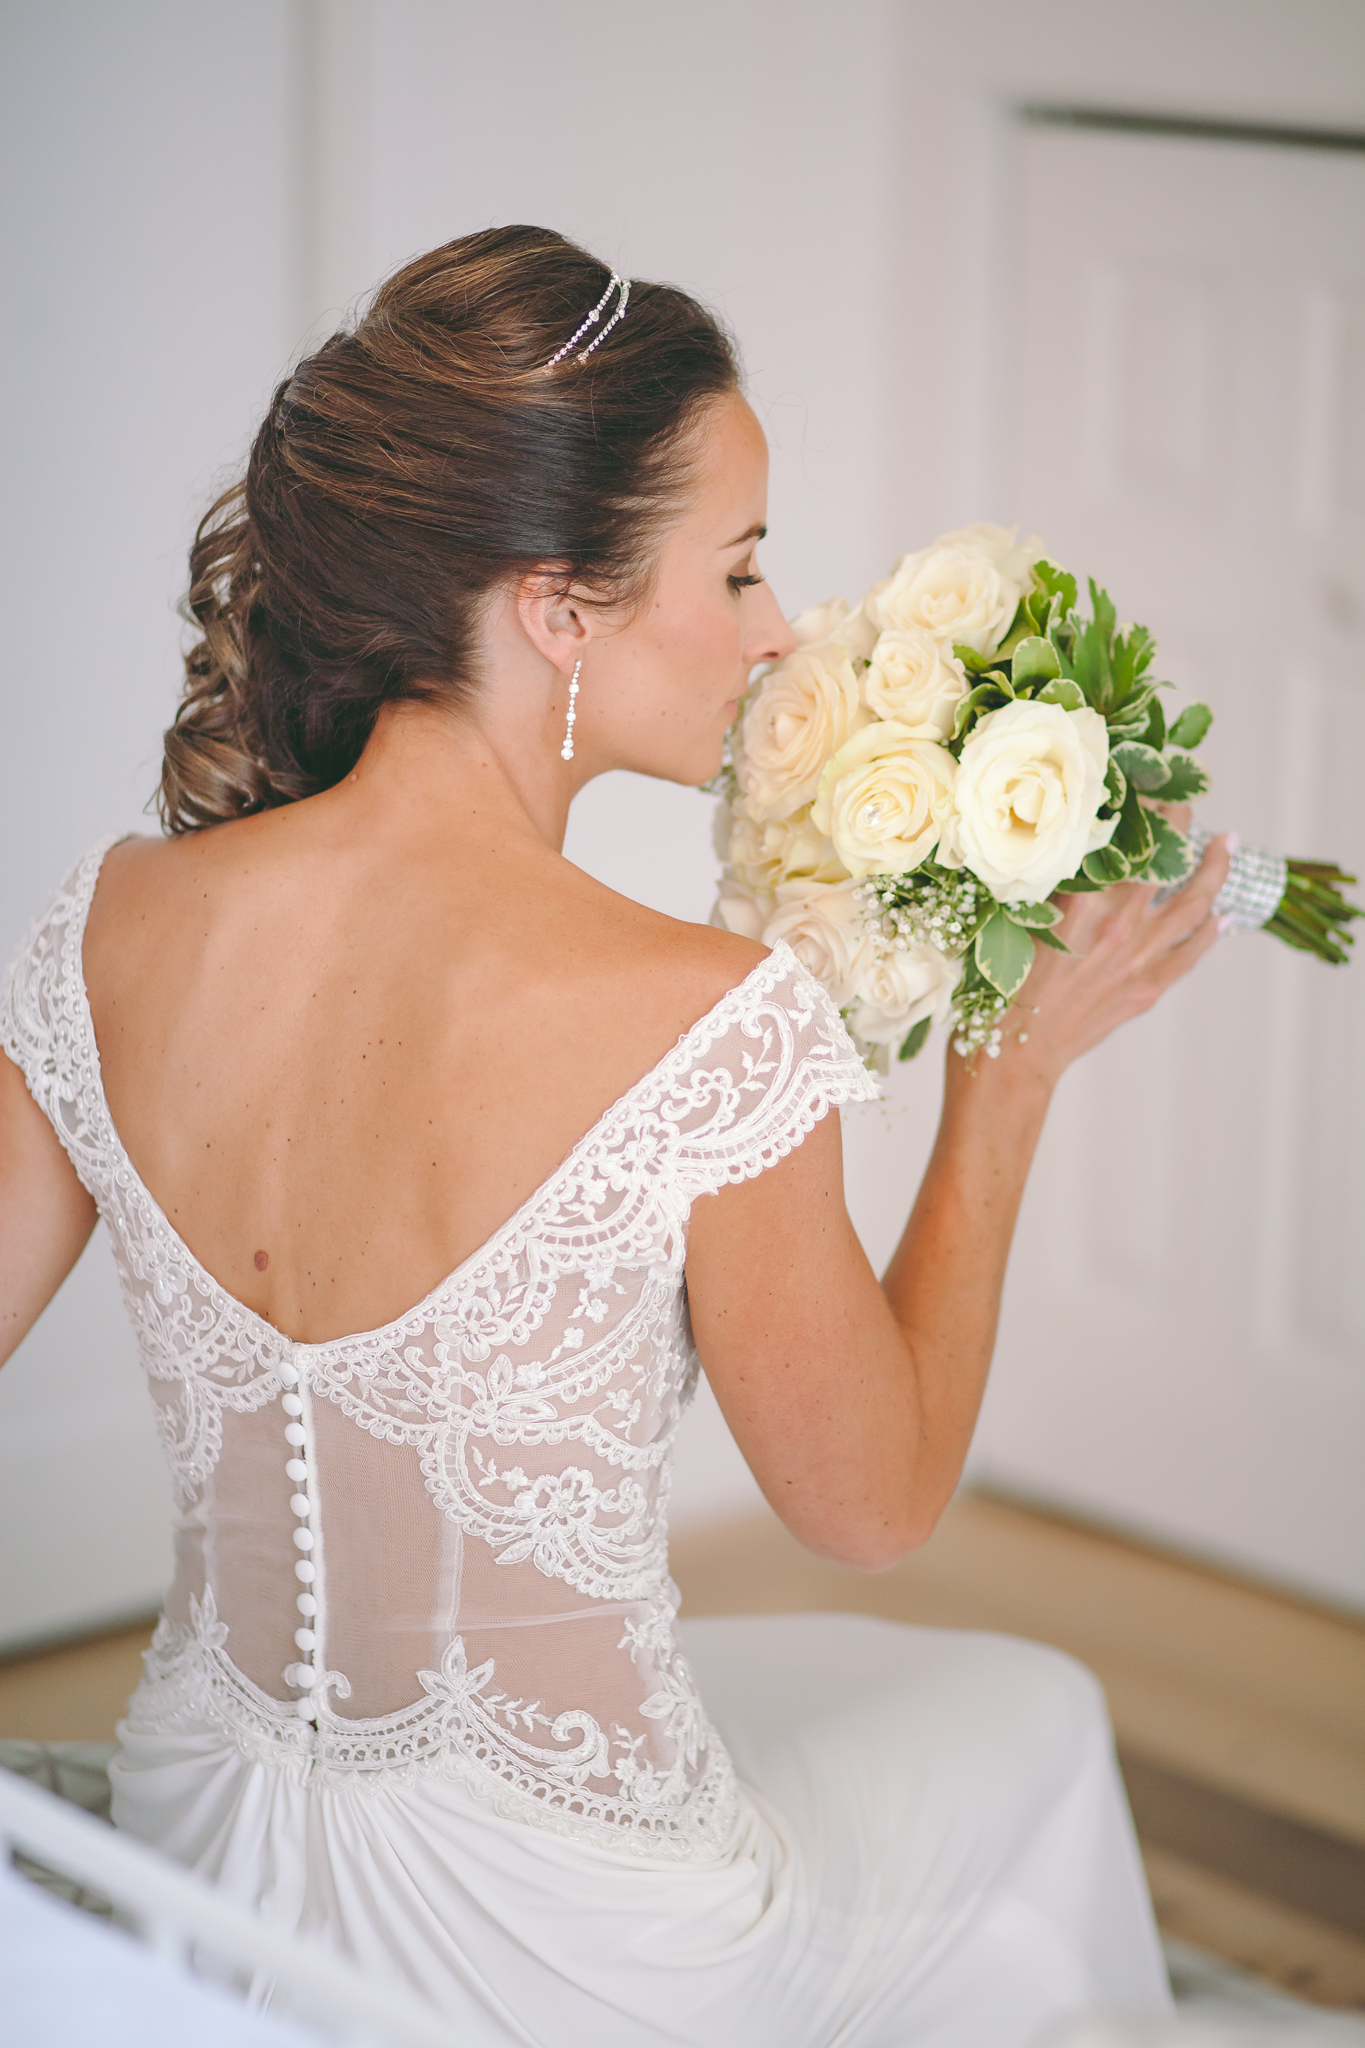 Amy D Photography- Barrie Wedding Photography- Bride Getting Ready- Muskoka Wedding Photography- Best Wedding Photographers (80 of 130).jpg